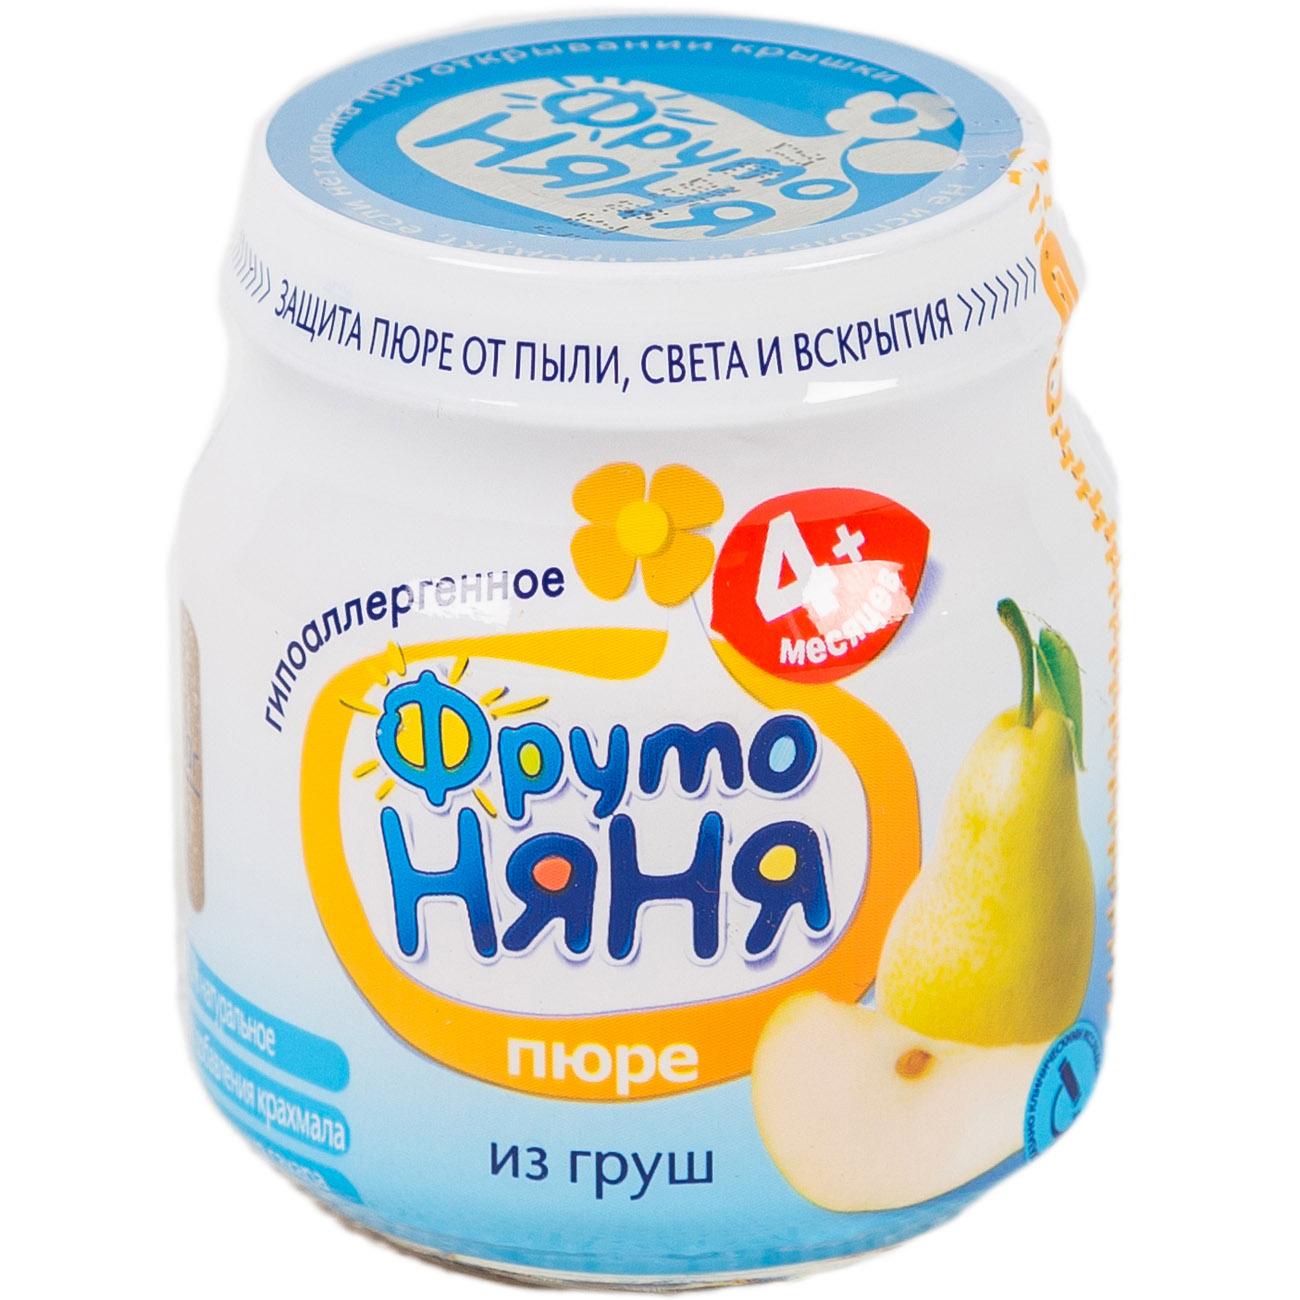 Пюре Фрутоняня фруктовое 100 гр Груша гипоаллергенная без сахара (с 4 мес)<br>